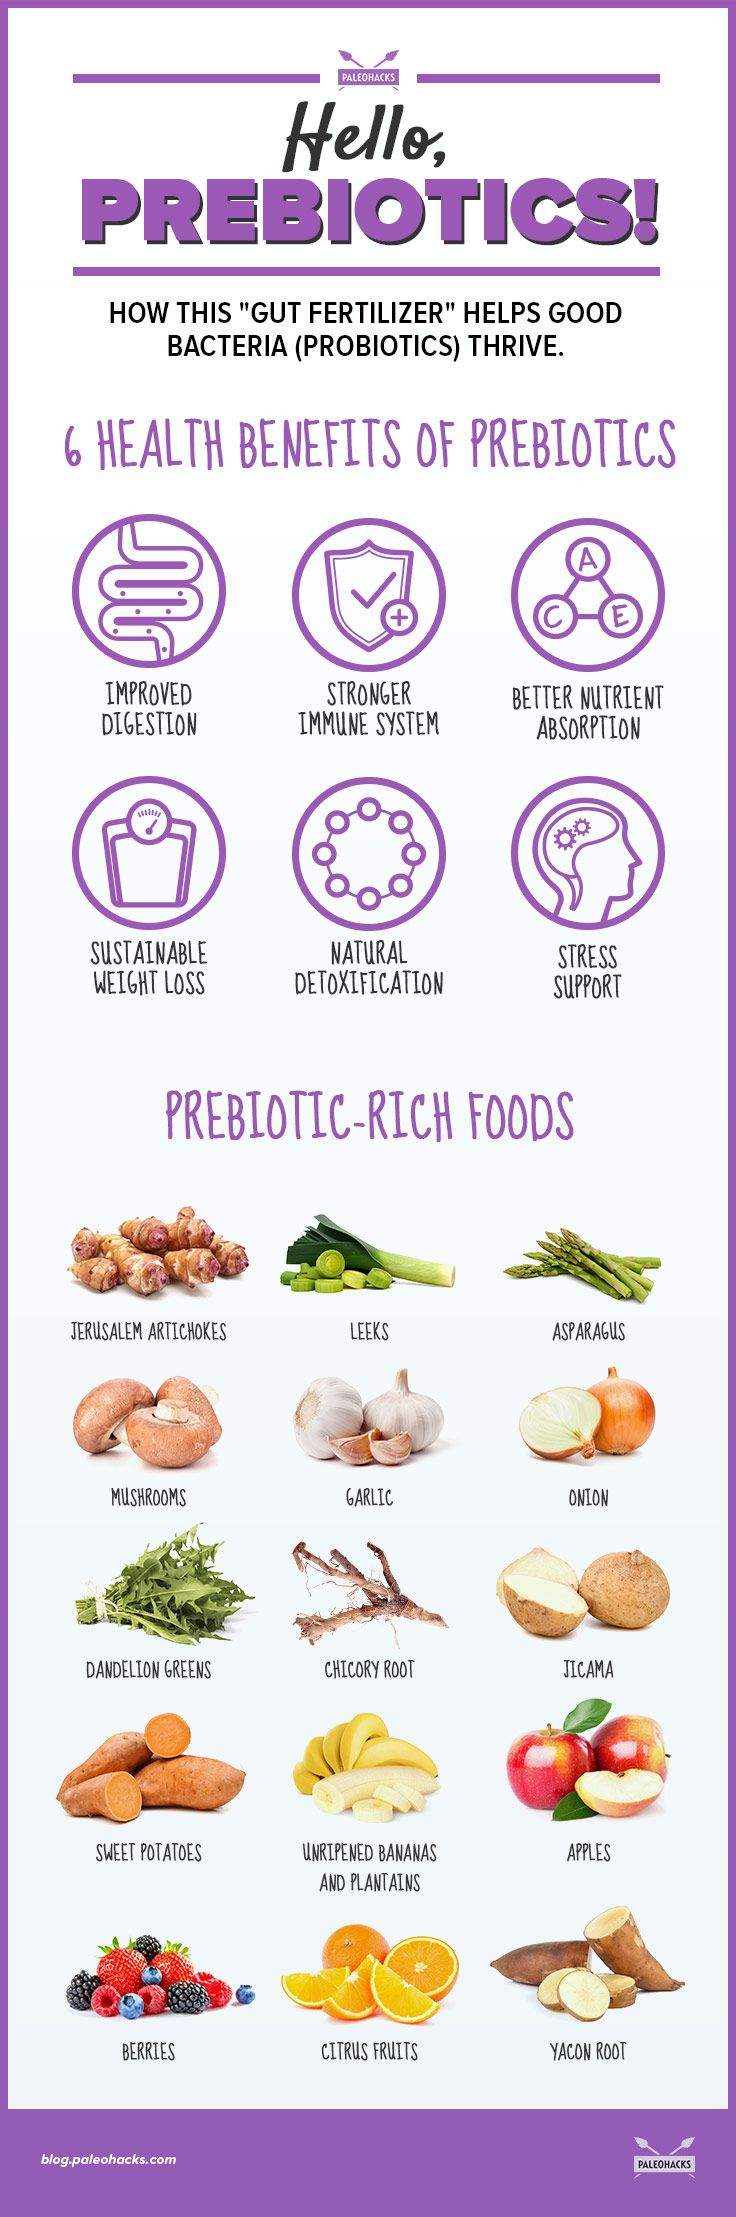 Prebiotics 6 Benefits Of This Gut Fertilizer And